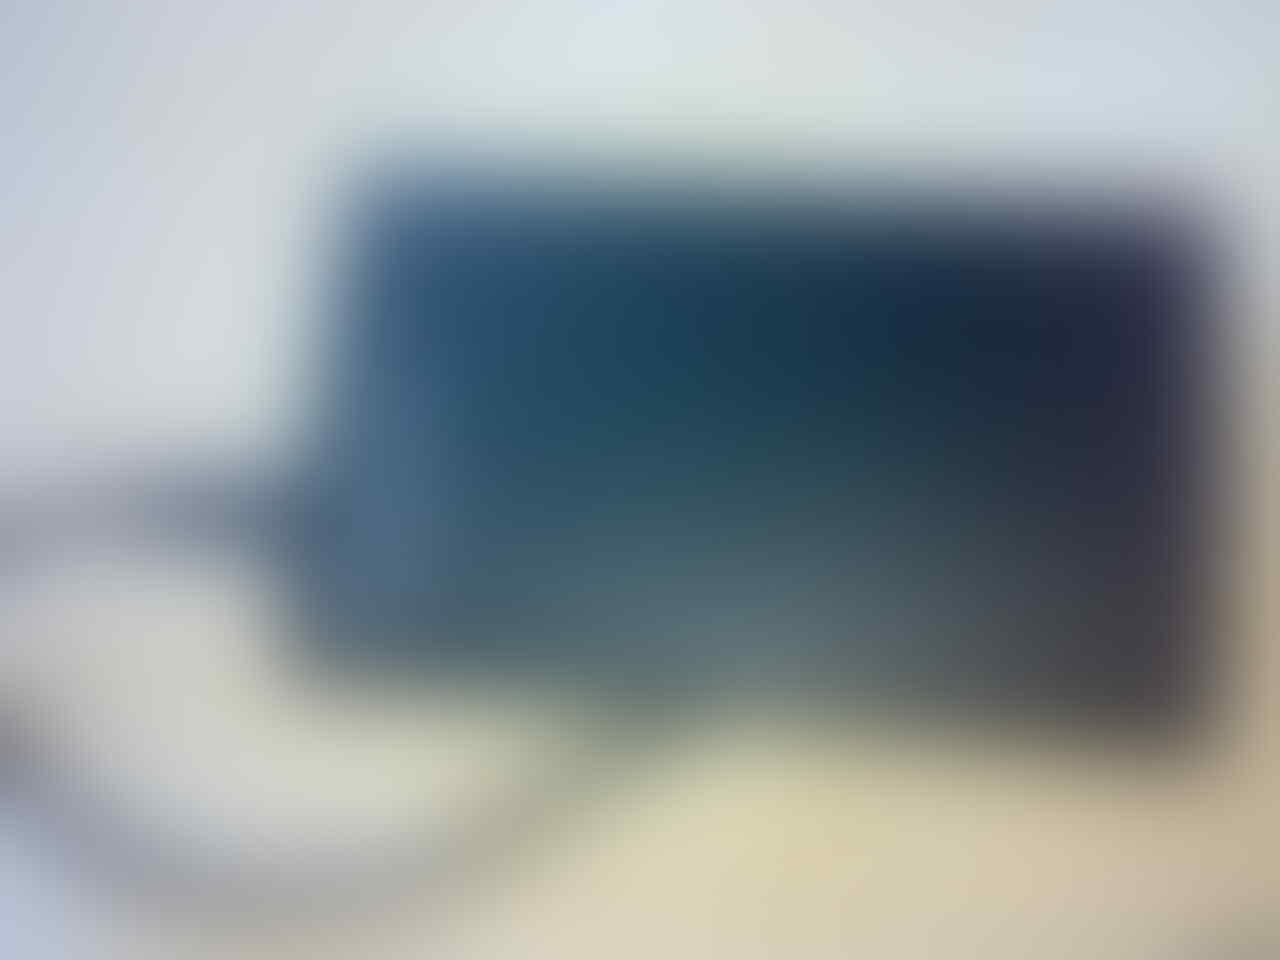 DIJUAL HDD 320GB EXTERNAL WDC MURAHH SAJA LAAHH